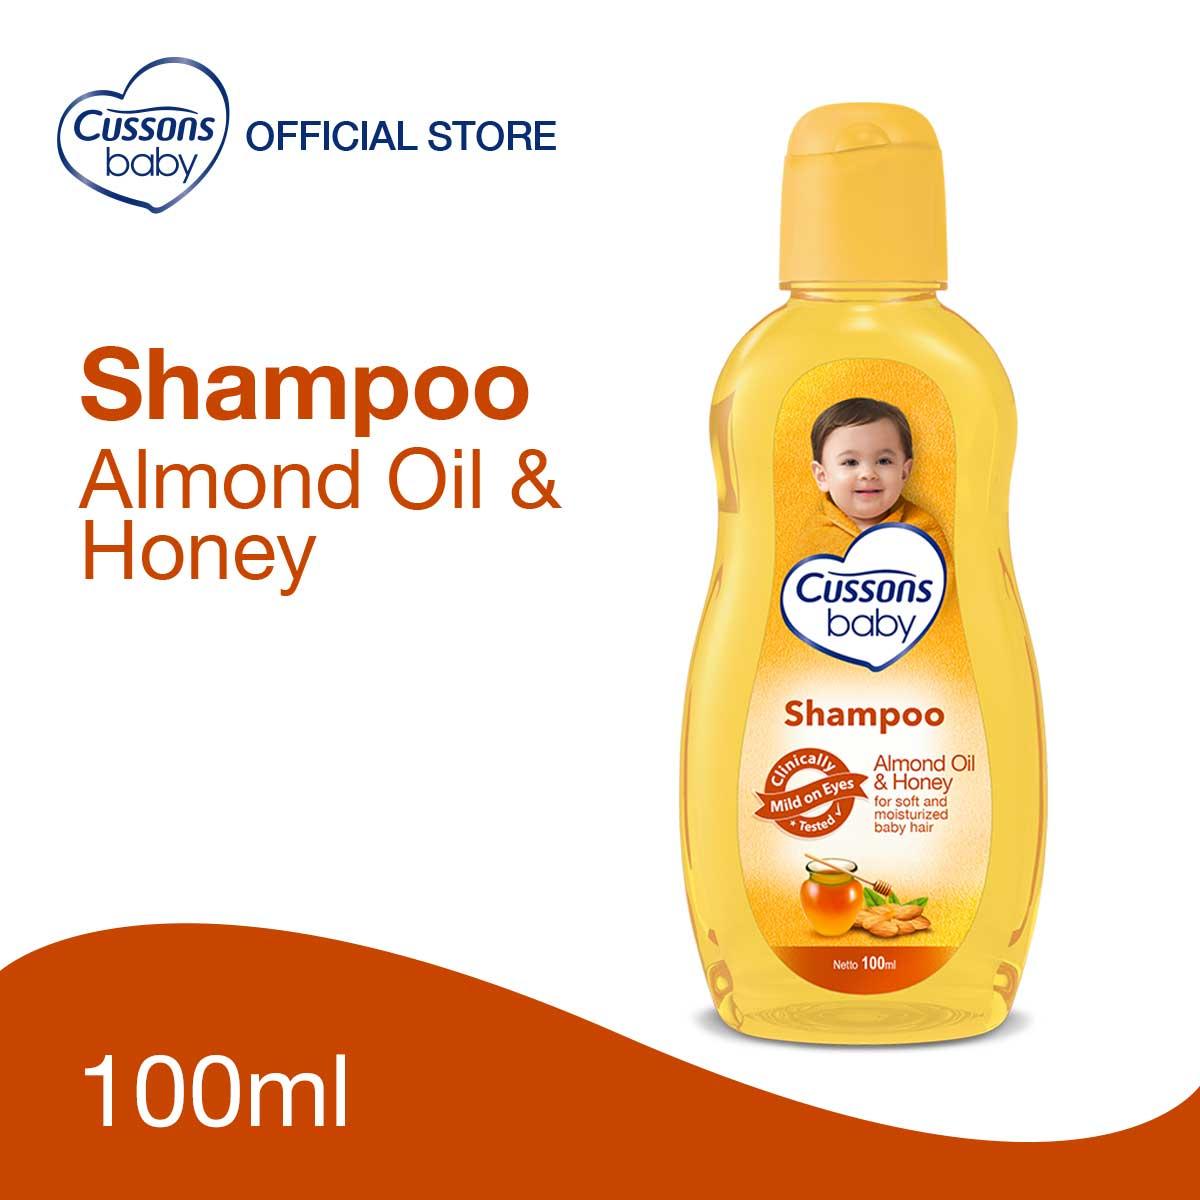 Cussons Baby Shampoo Almond Oil & Honey 100ml